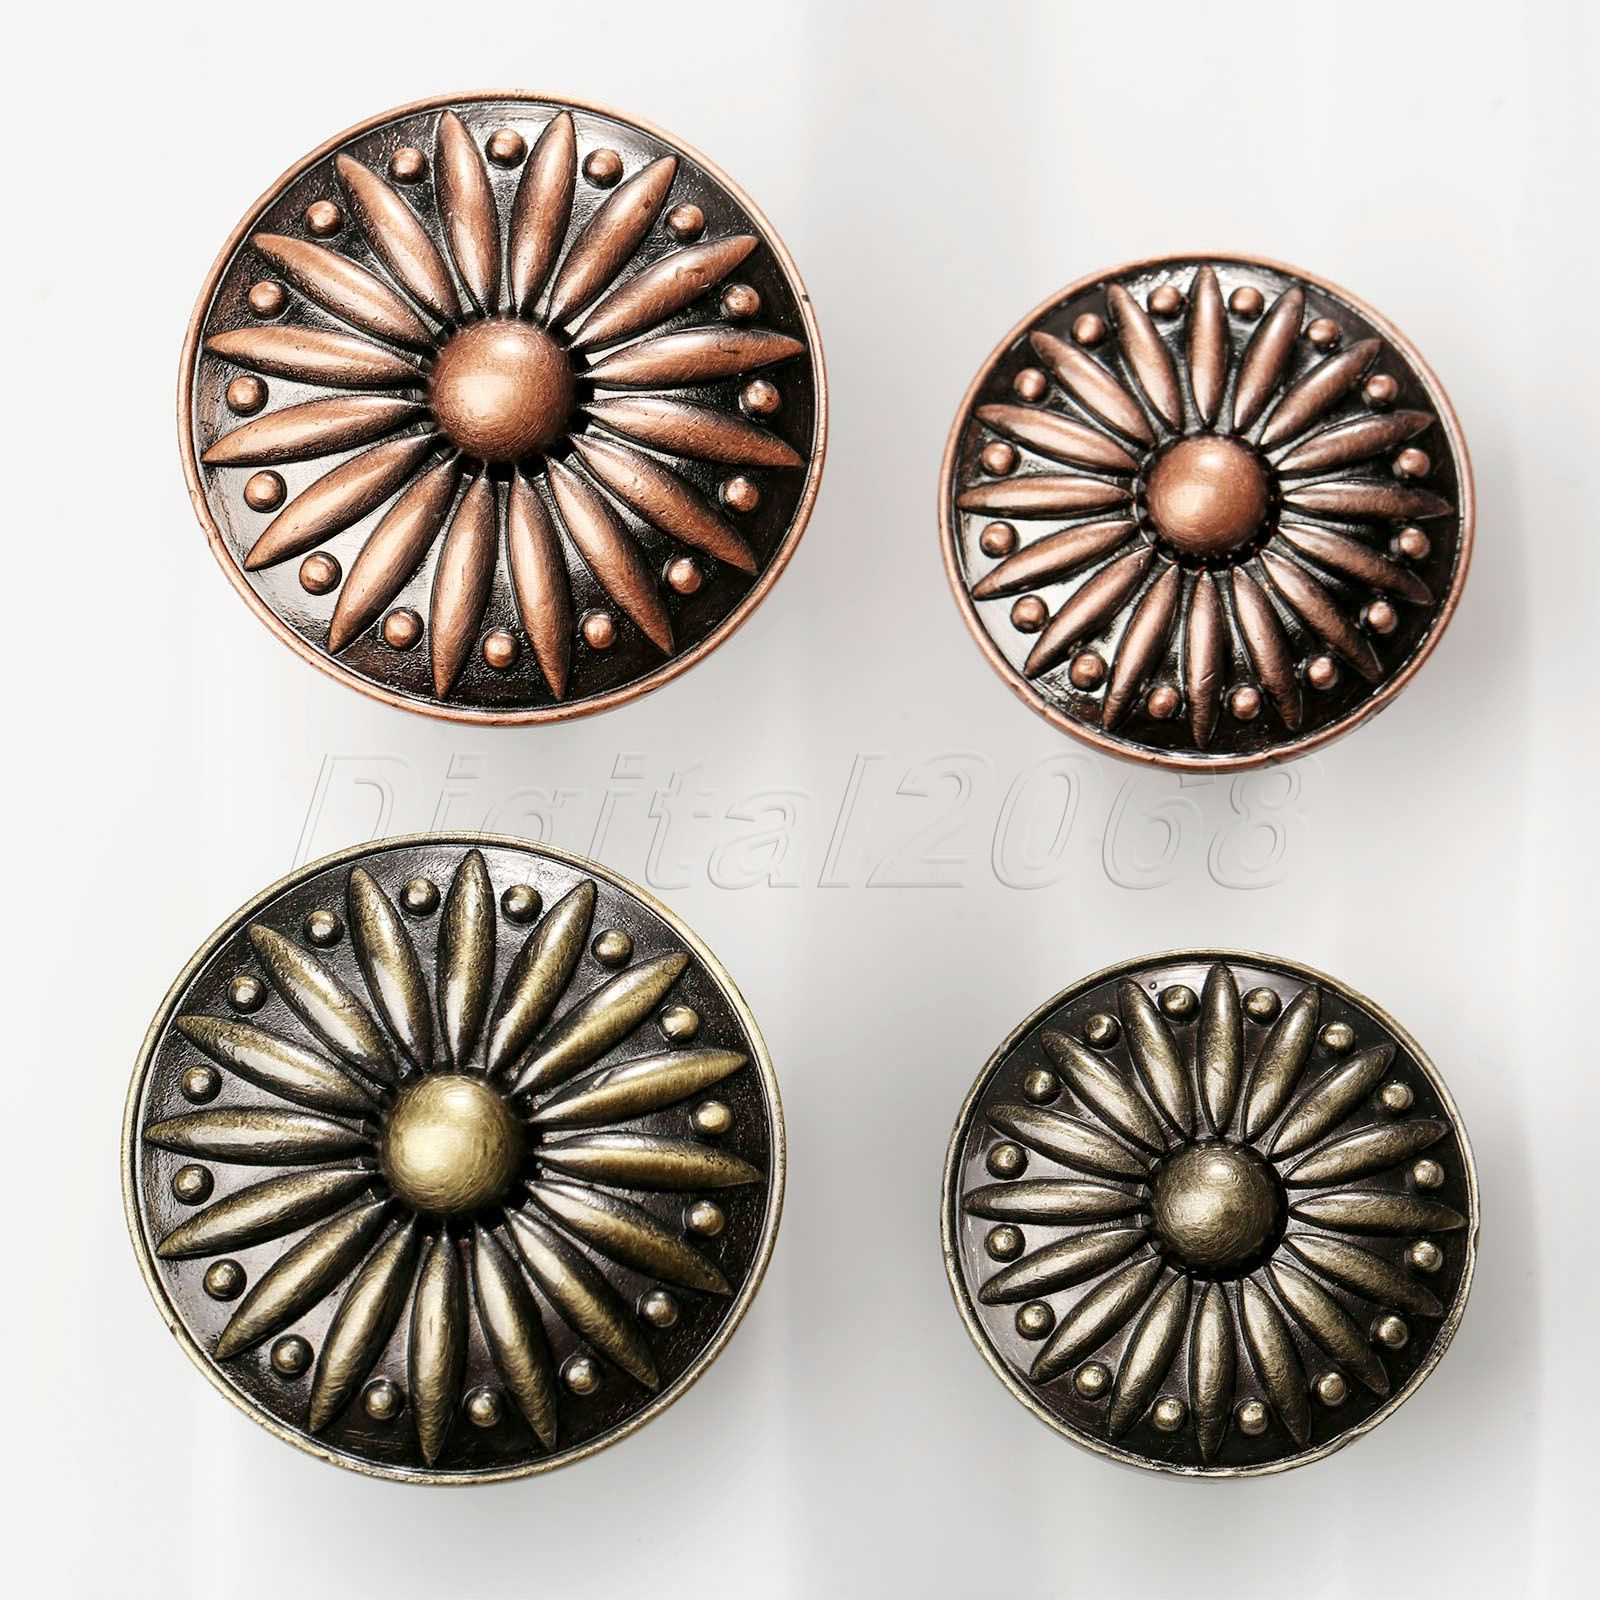 Cabinet Door Mini Pull Knobs Retro Round Antique Rose Flower Handle Single Hole